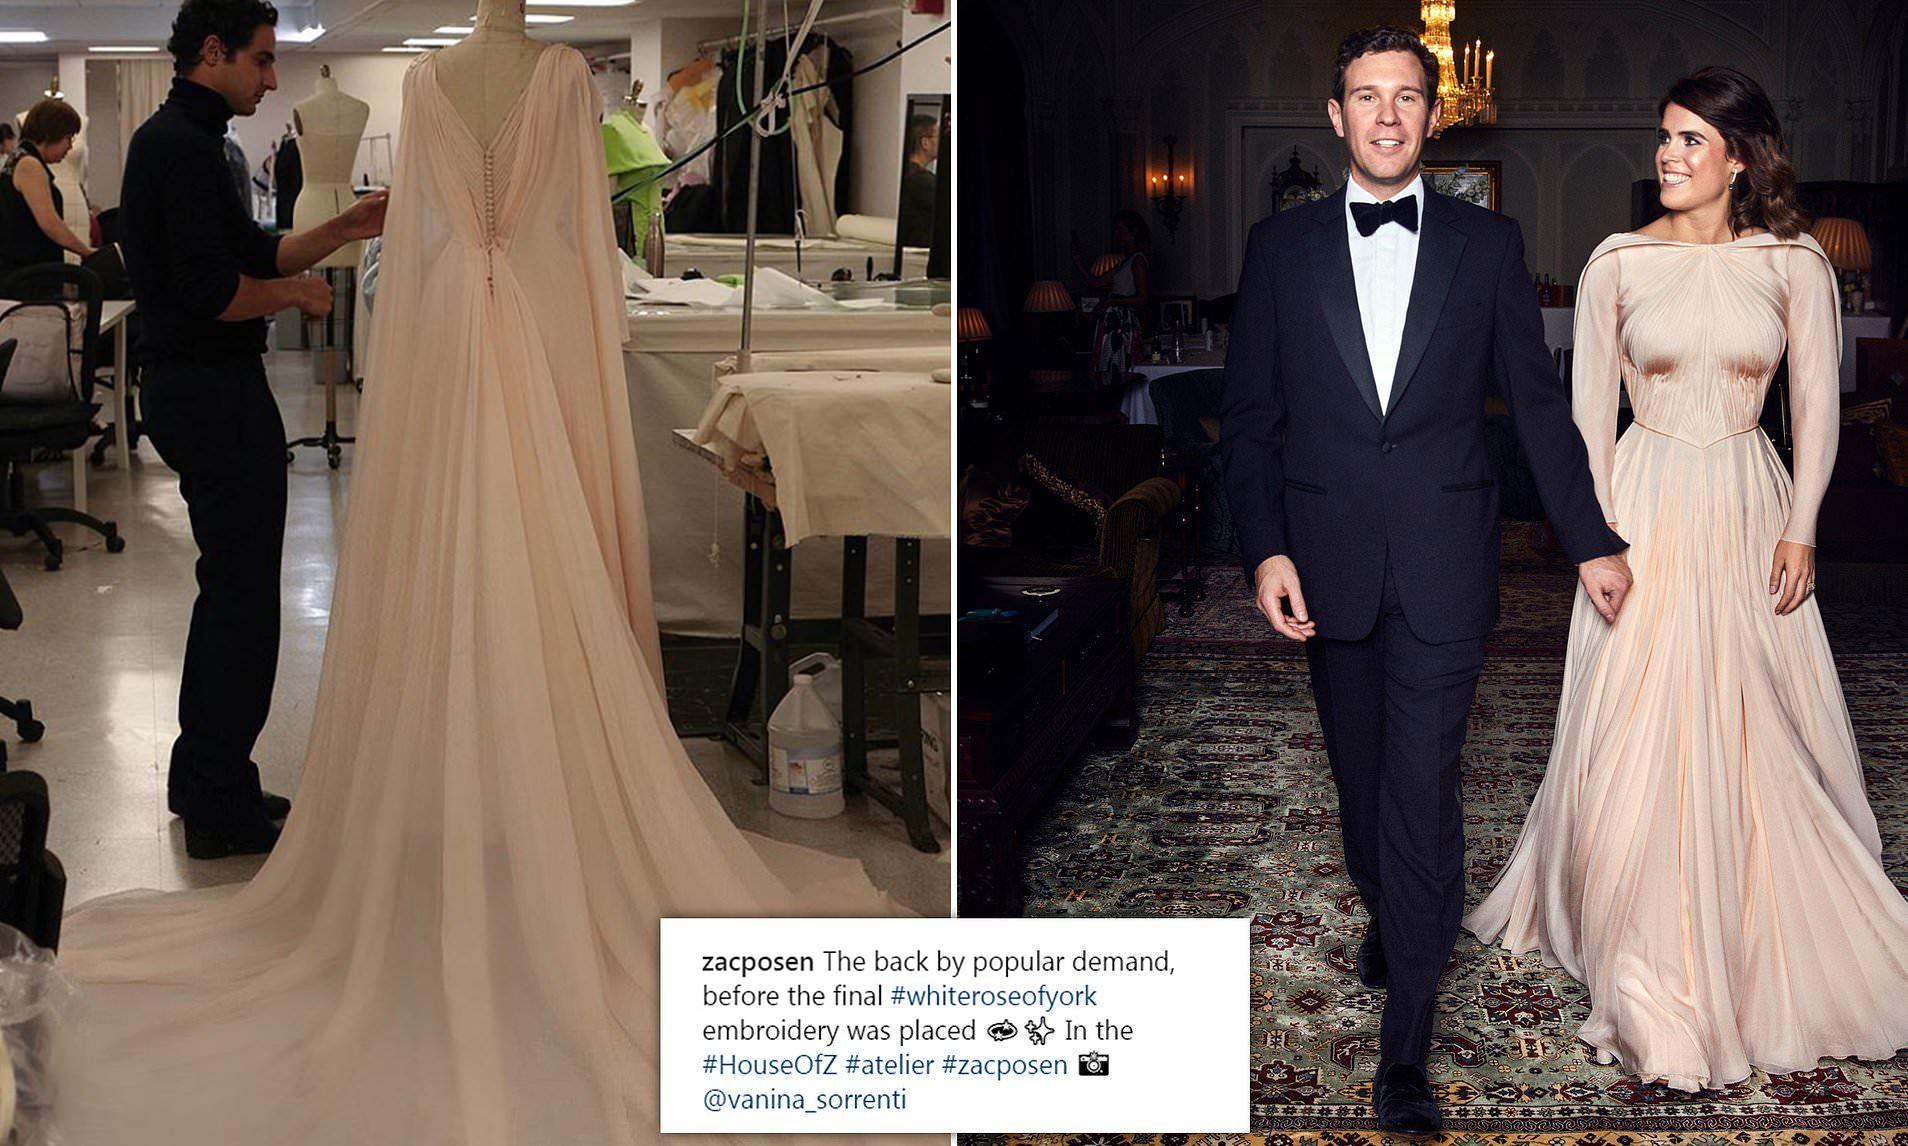 Princess Eugenie's evening dress also showed off scoliosis